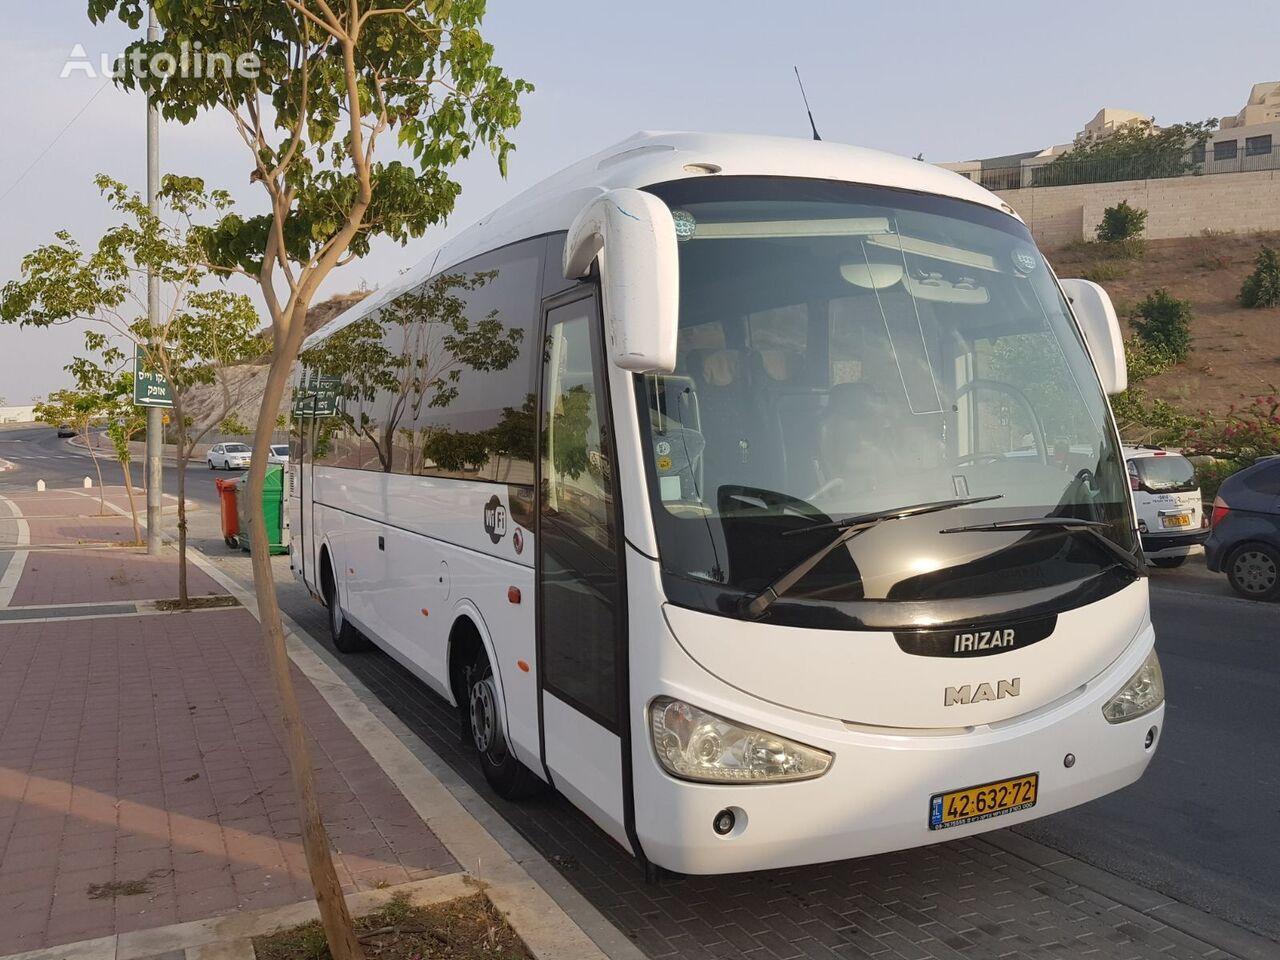 MAN IRIZAR 5 BUSES FOR SALE coach bus